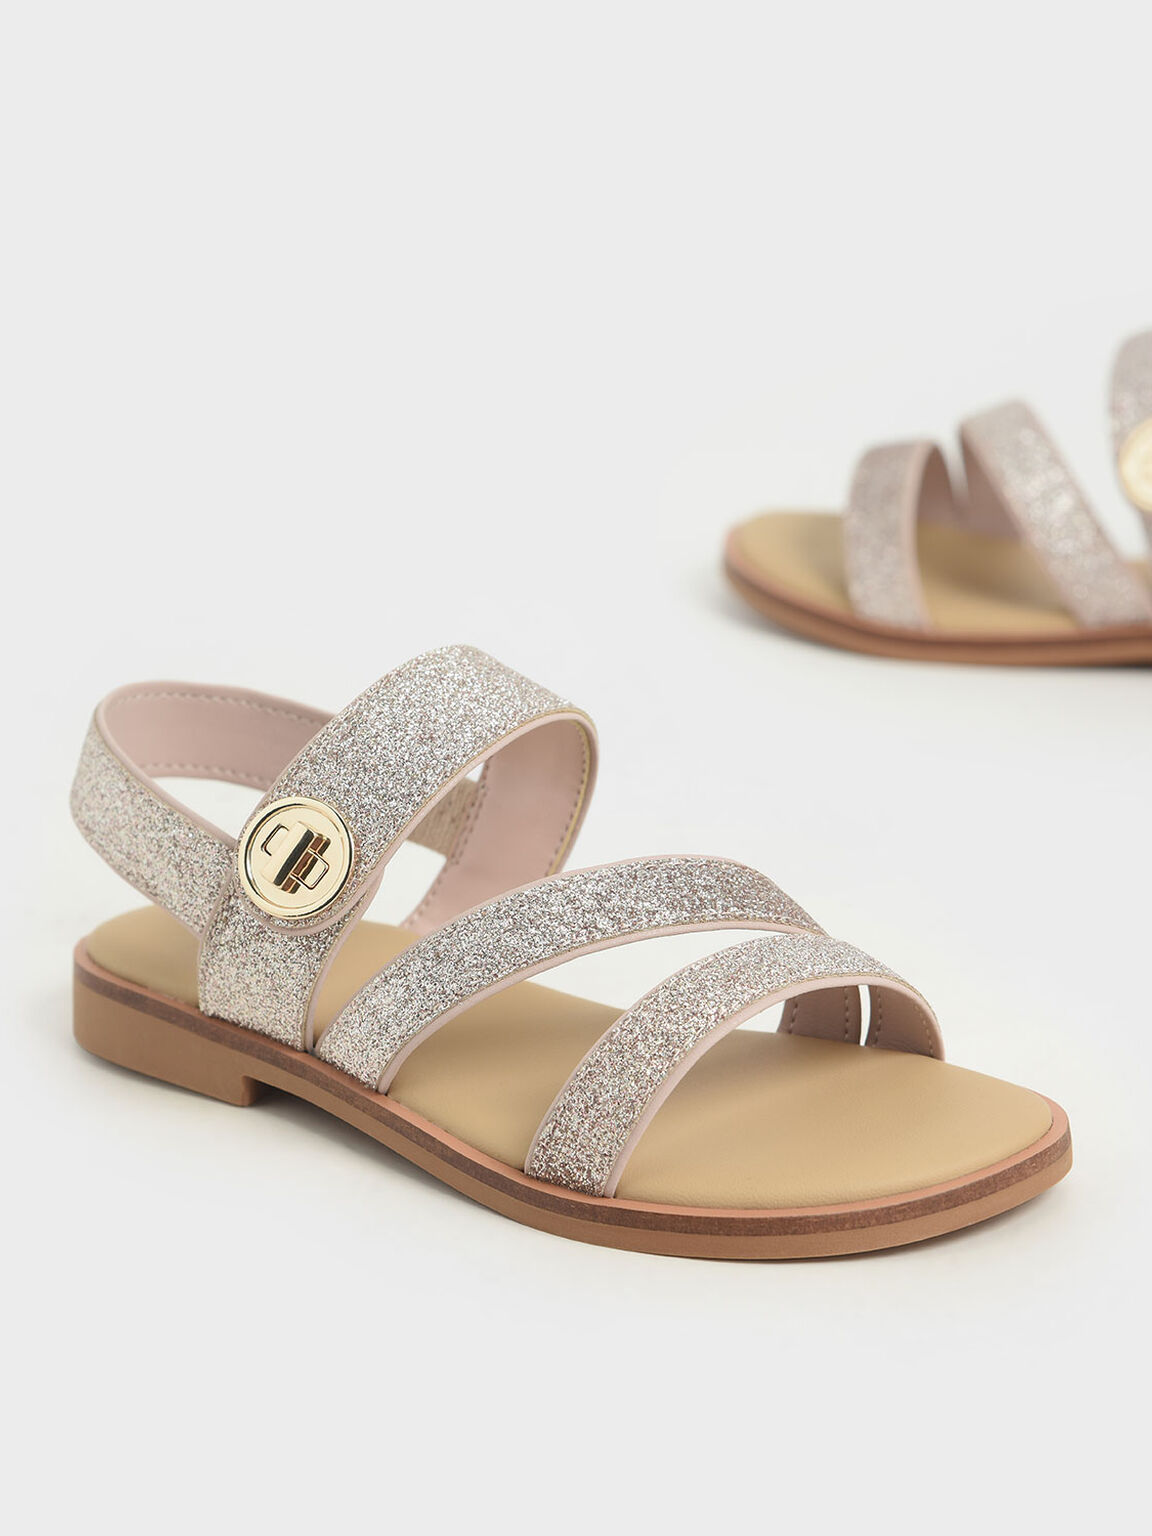 Girls' Glittered Metallic Buckle Sandals, Silver, hi-res